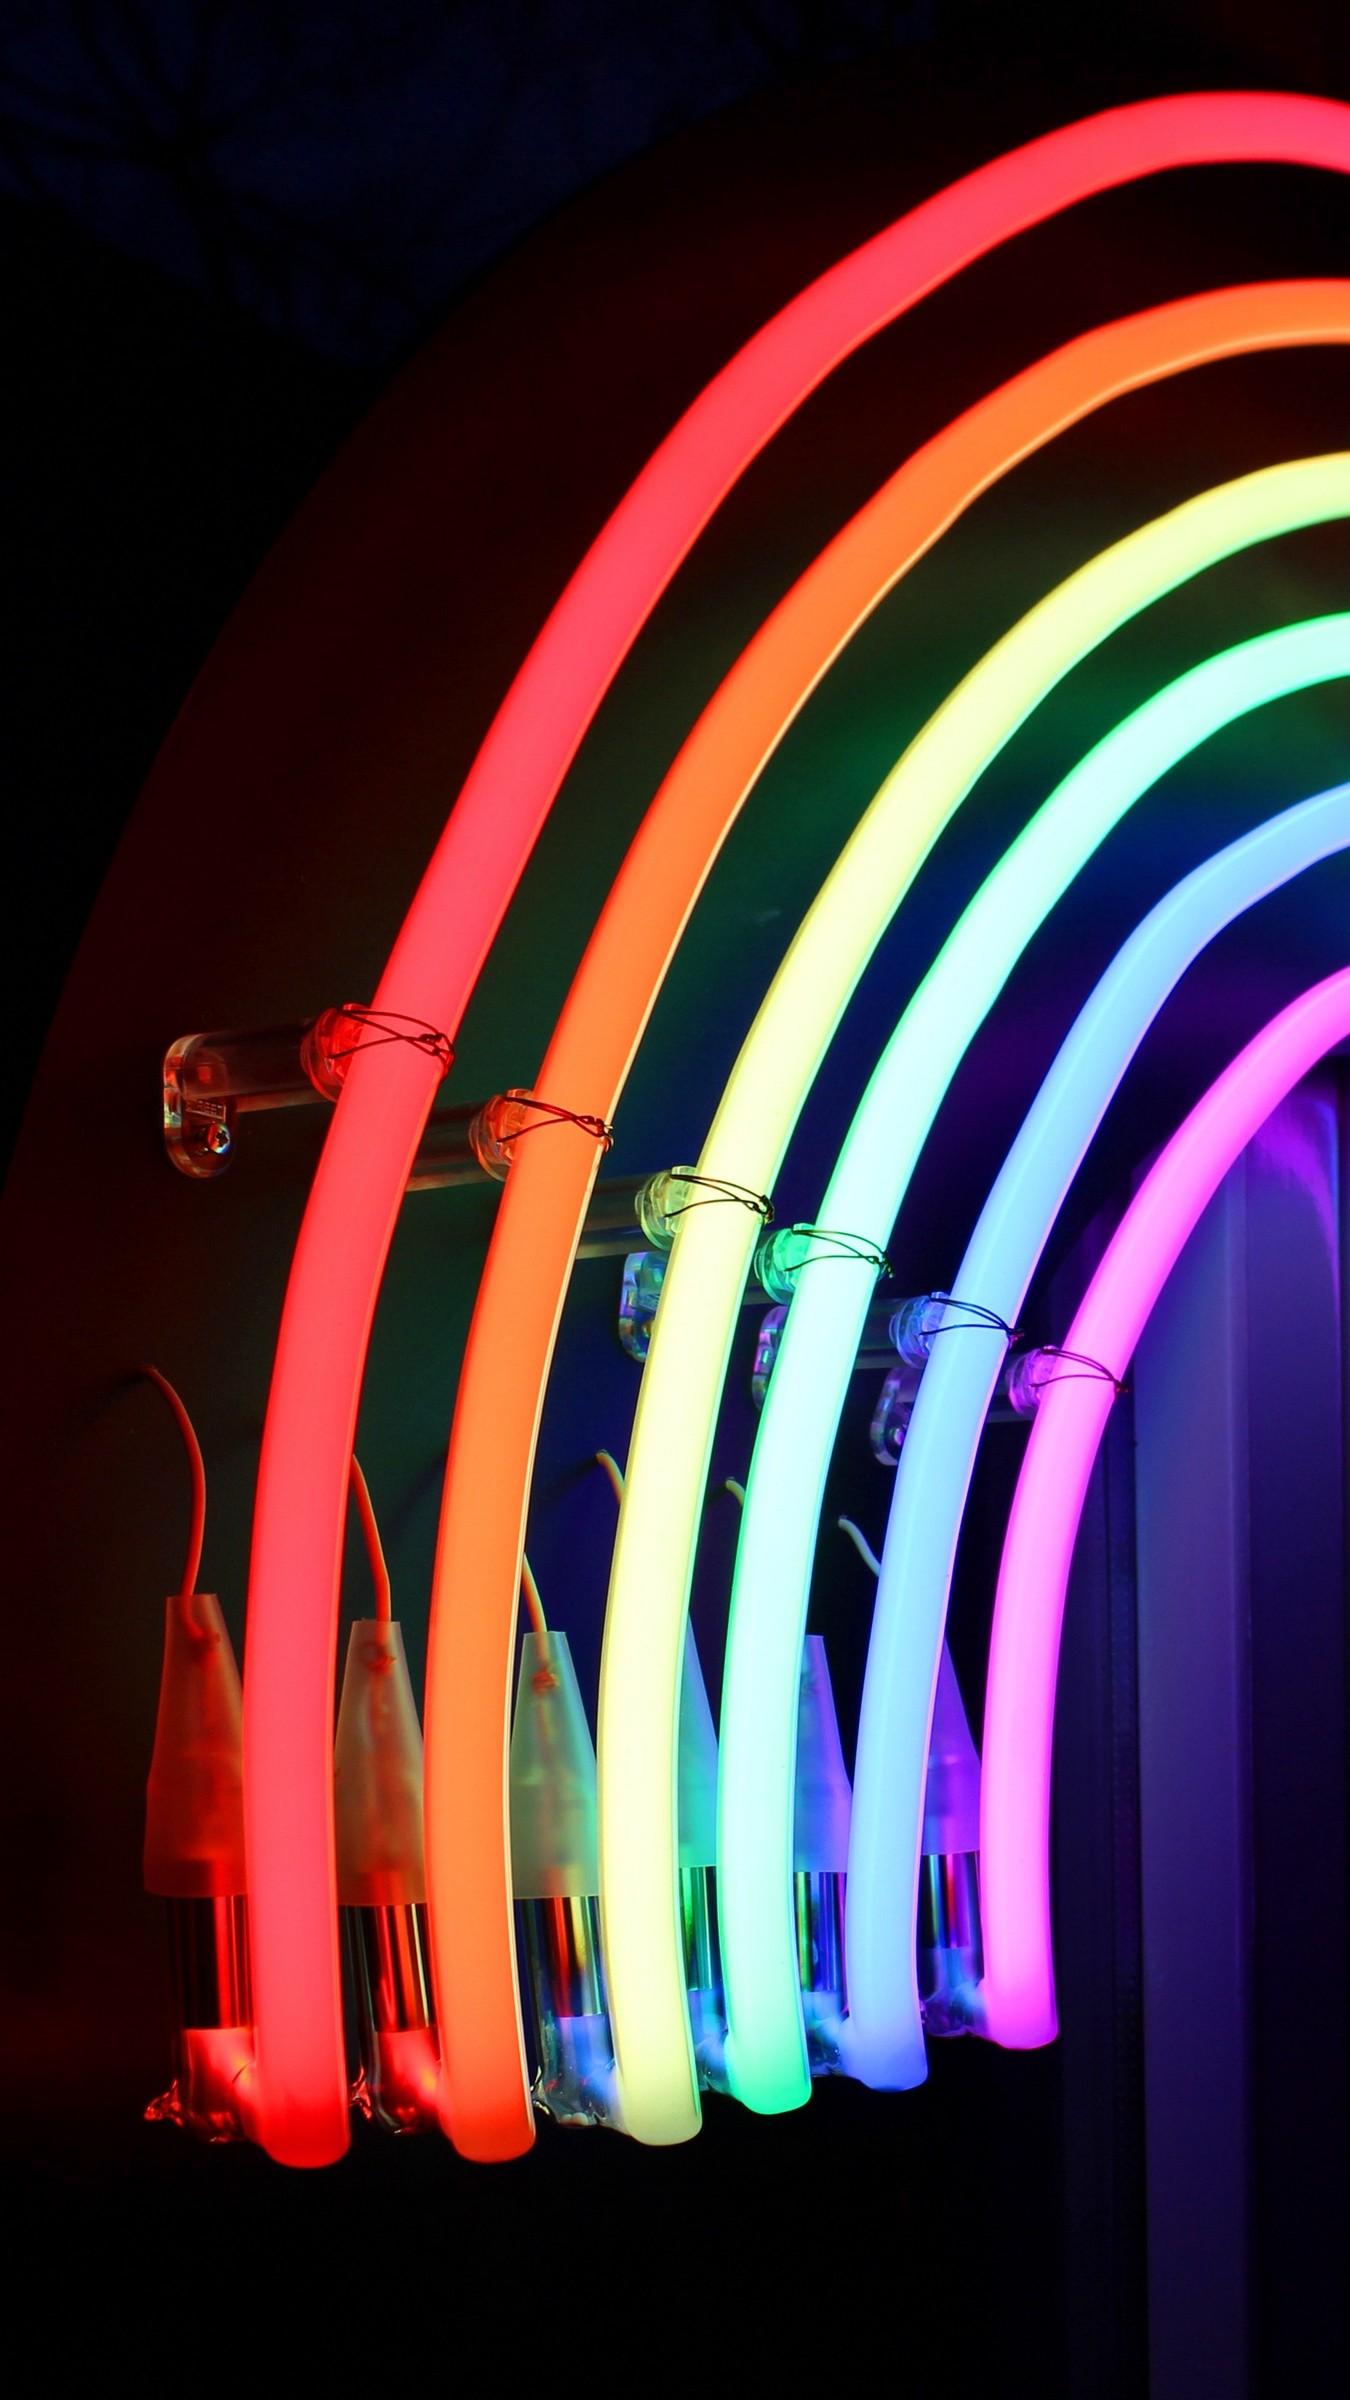 Wallpaper Neon, Light, Lamp, Bright, Lines   Data Src - Neon Light Iphone Background - HD Wallpaper